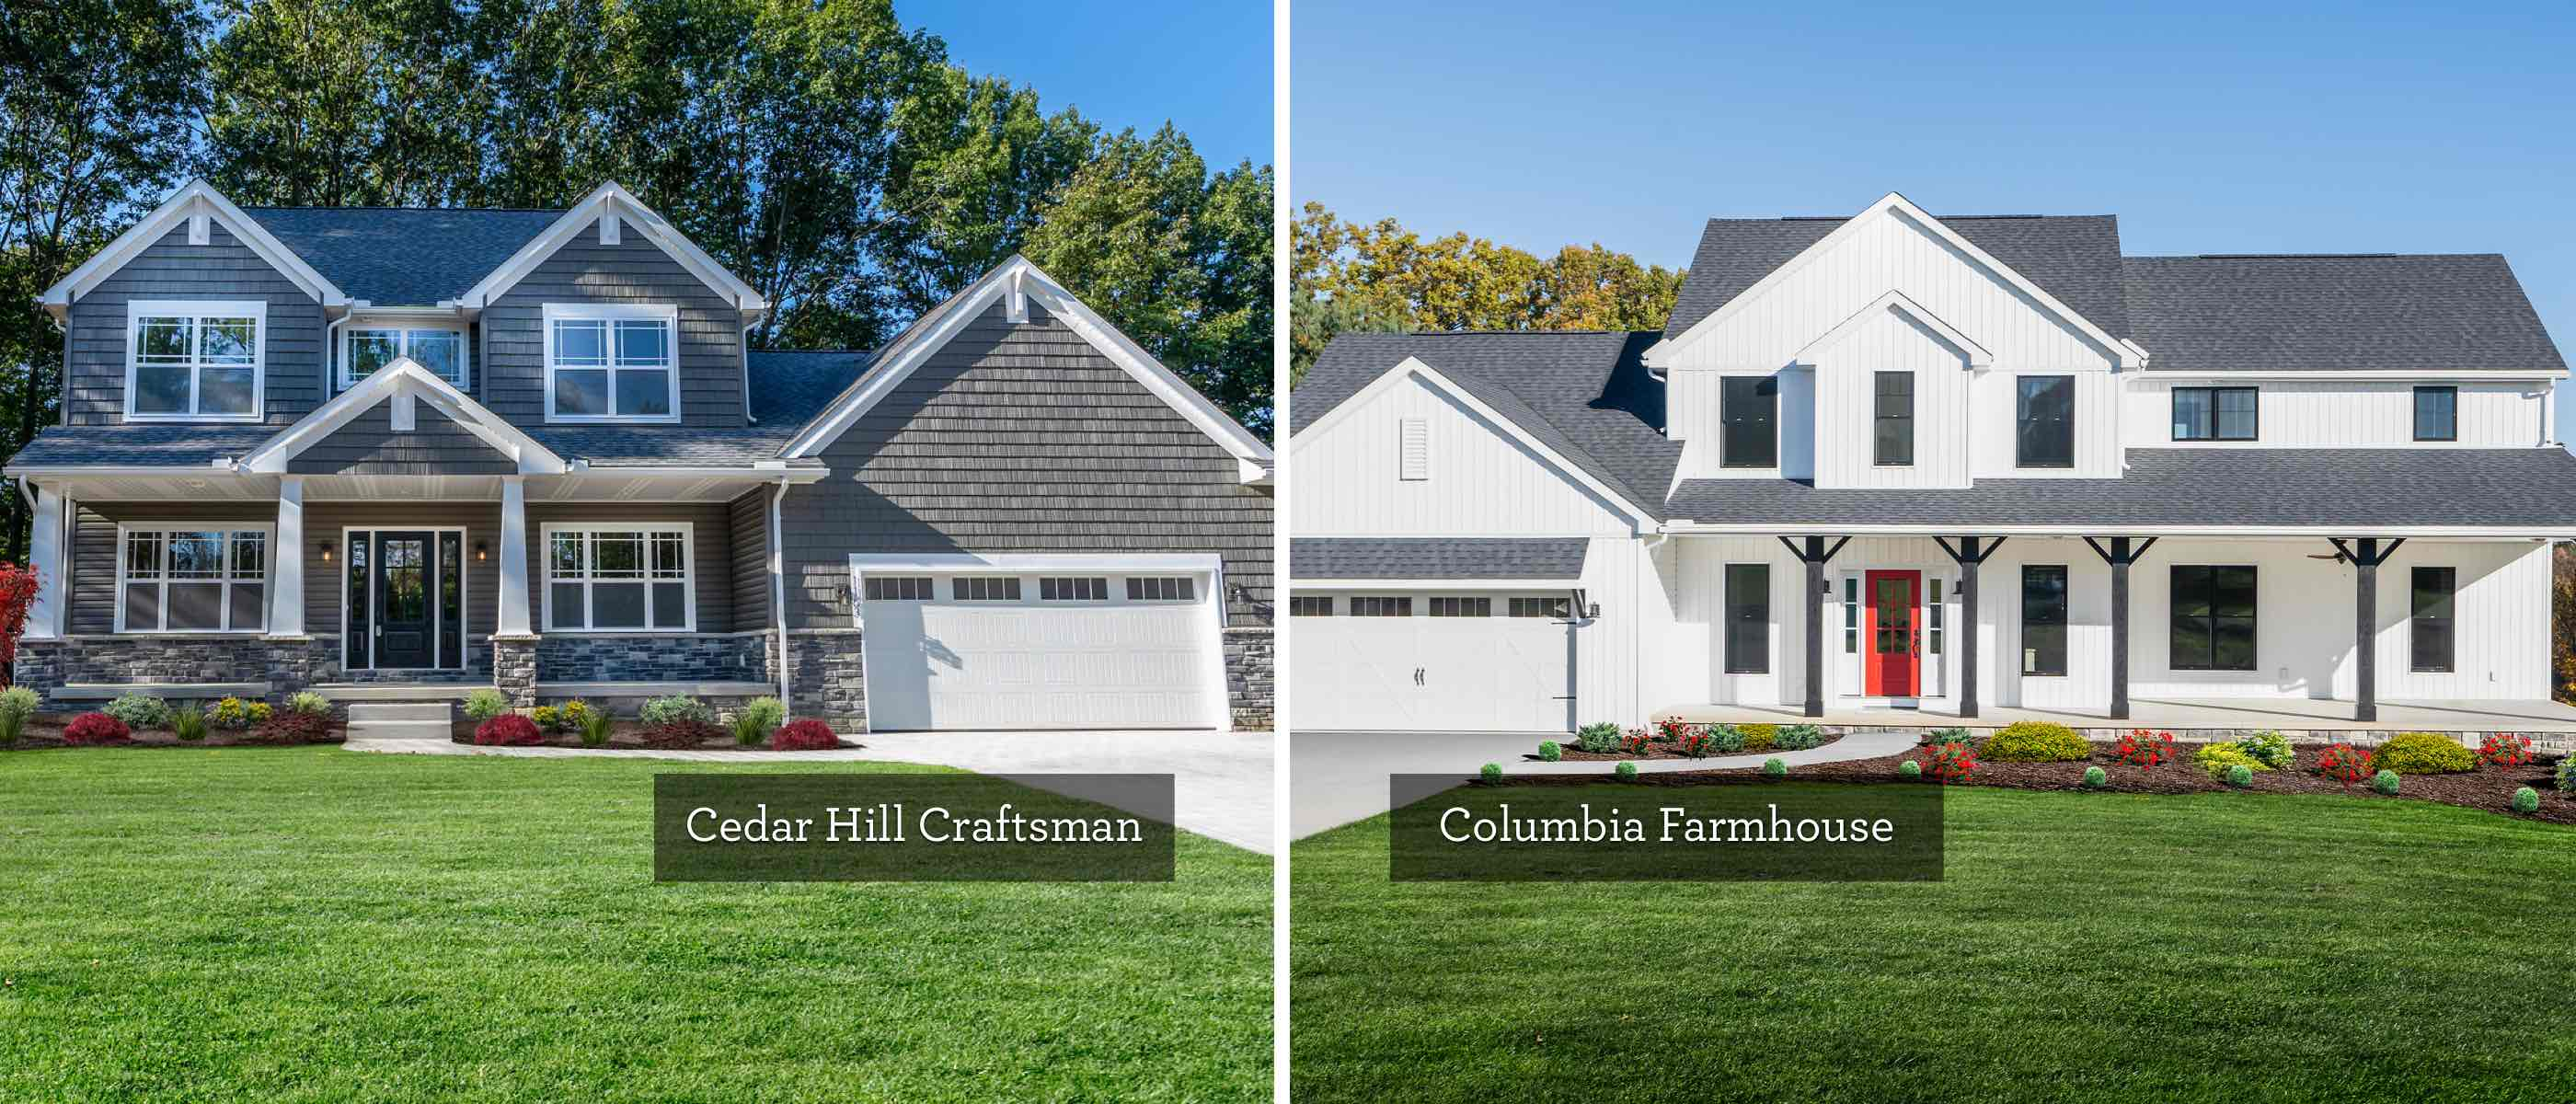 BW_Craftsman_vs_Farmhouse